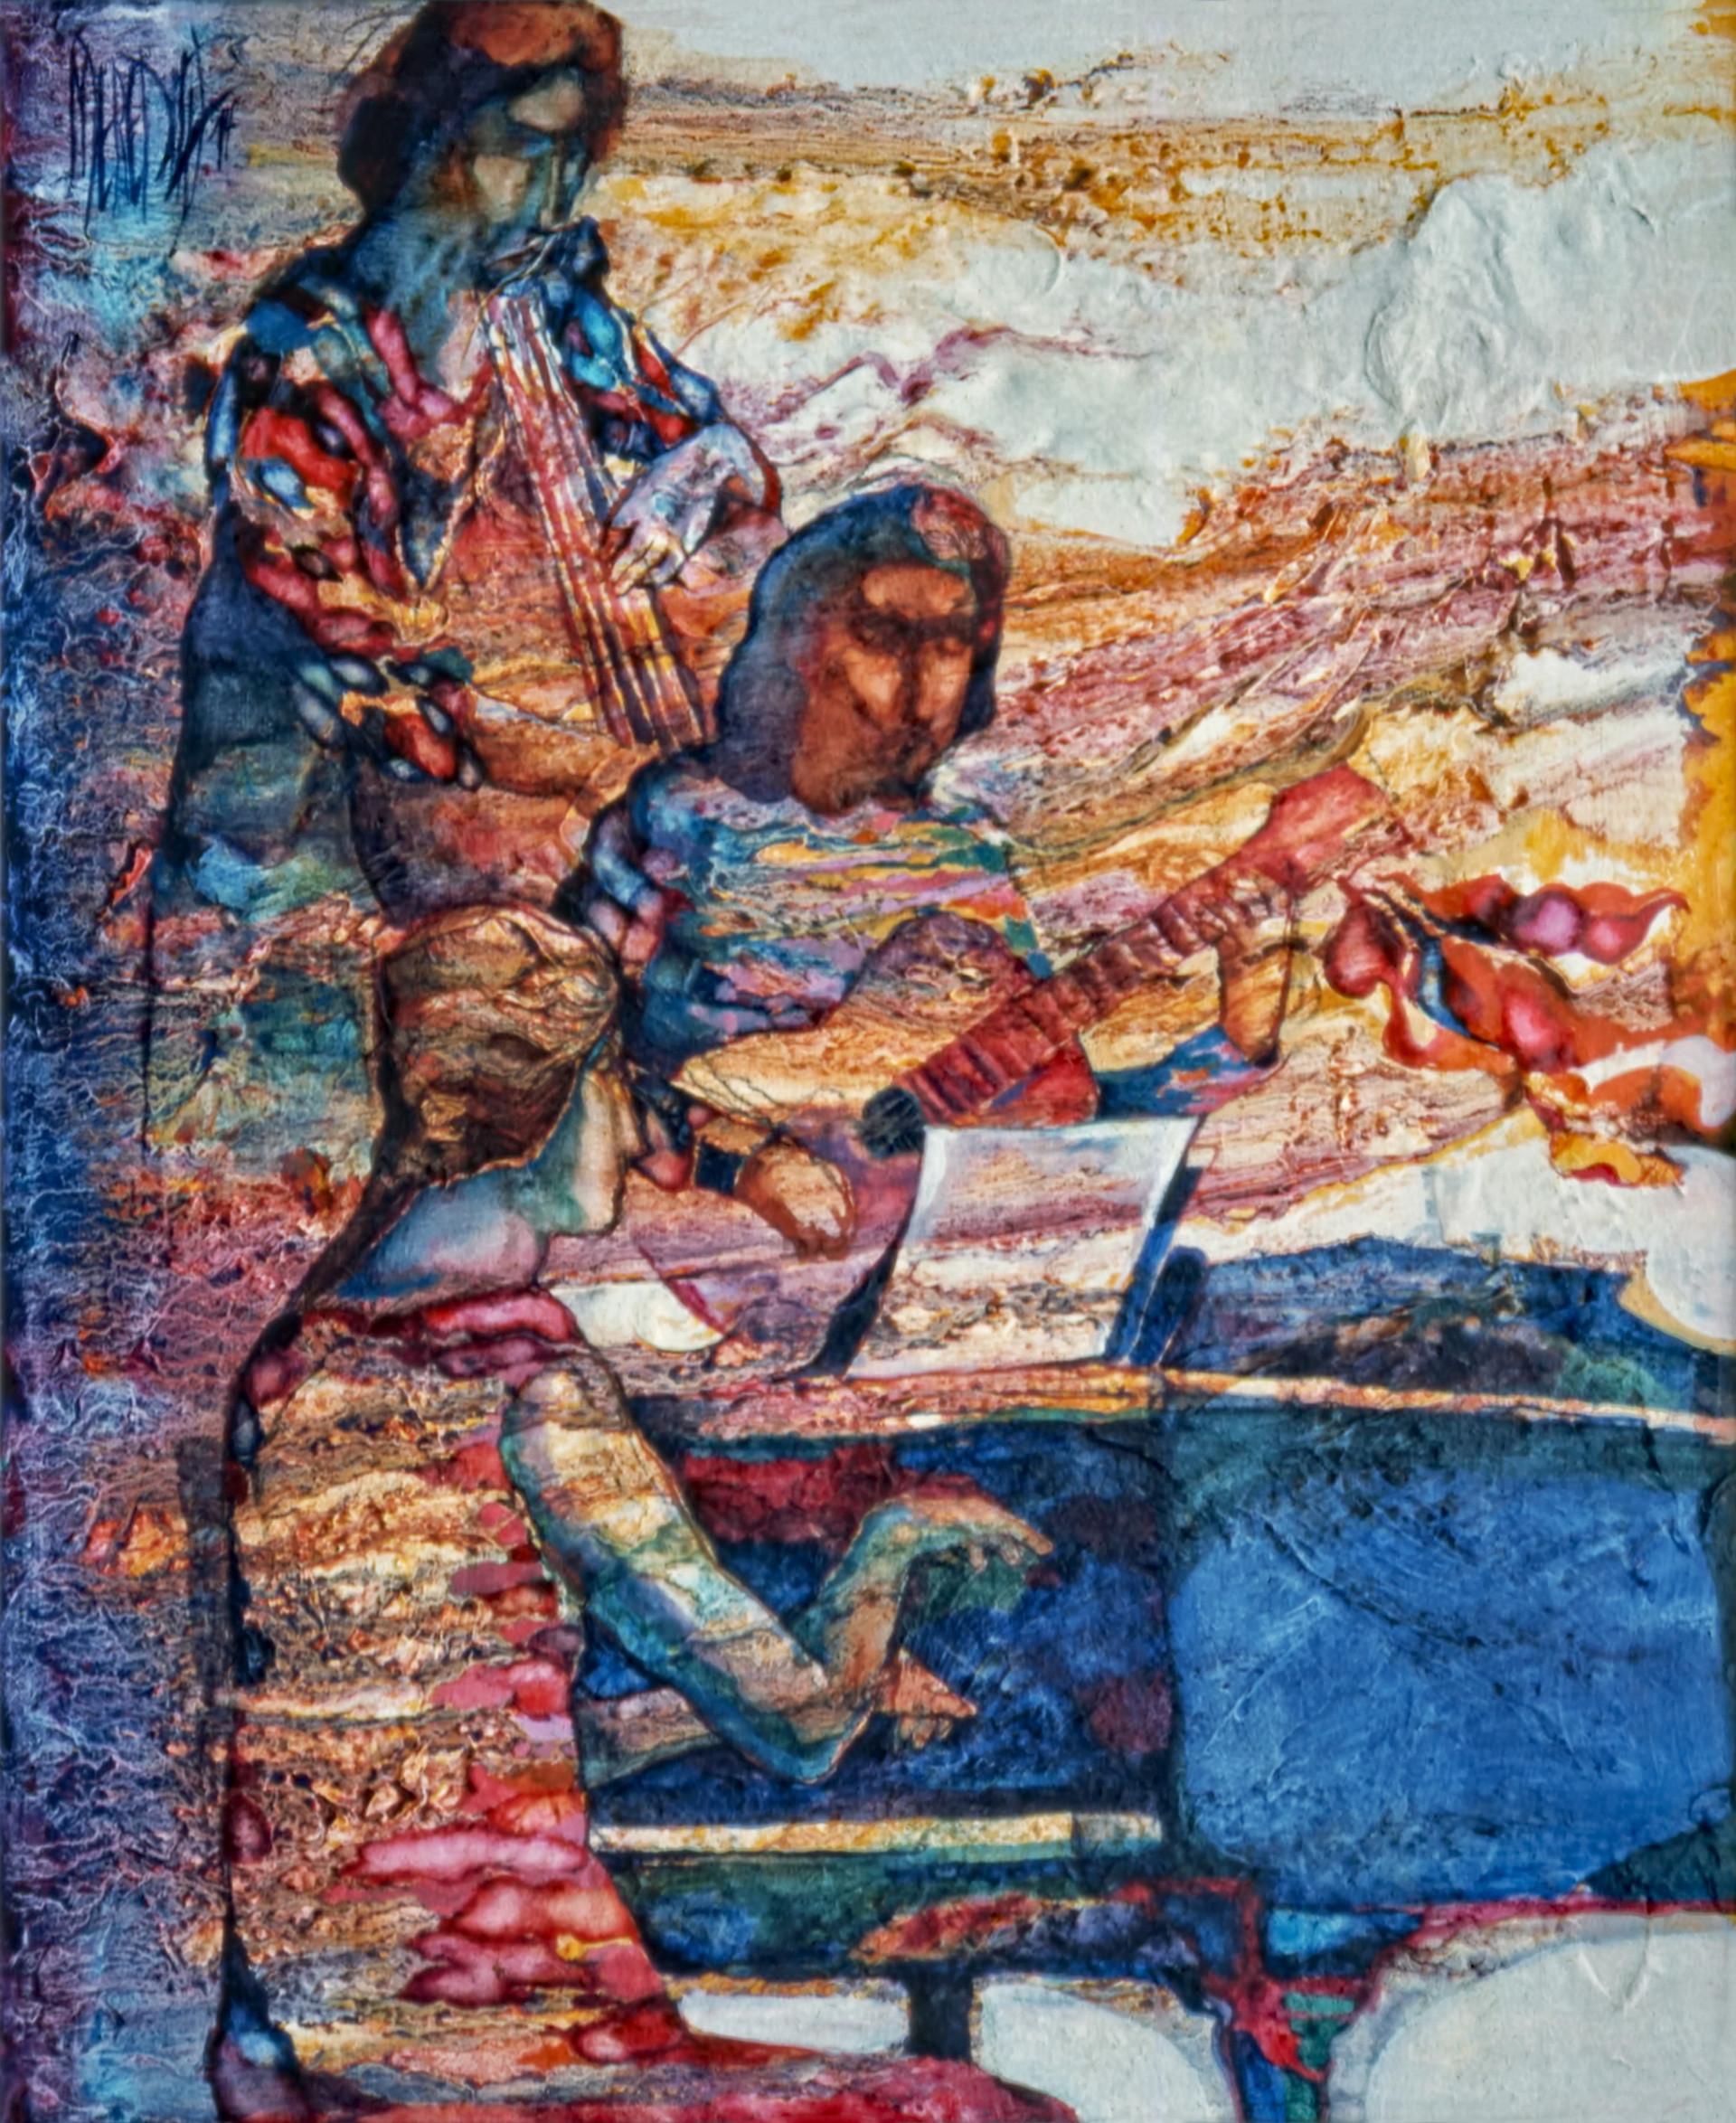 1976 - MUSICAL RHAPSODY - Oil on Canvas - 25X30